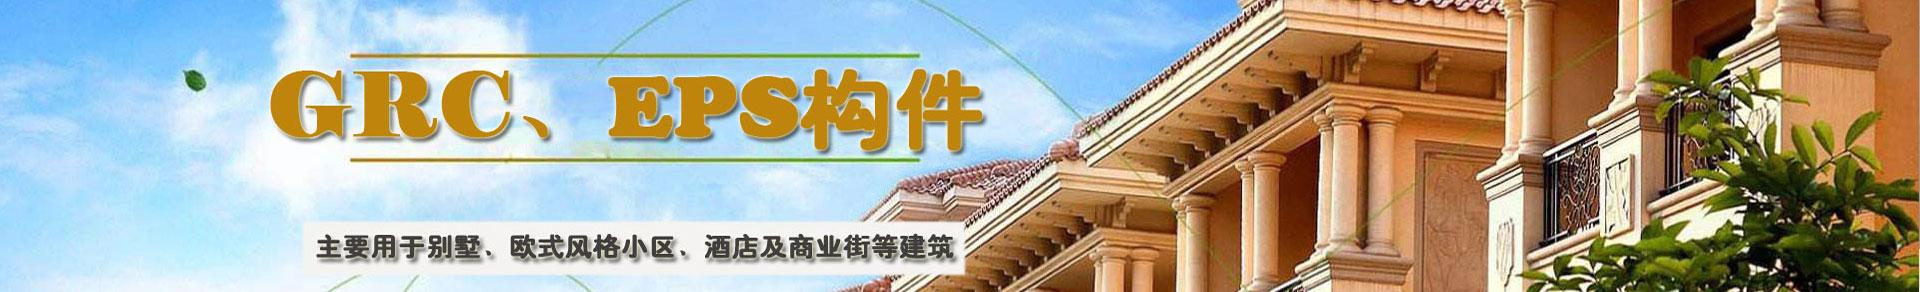 海南EPS构件通用banner